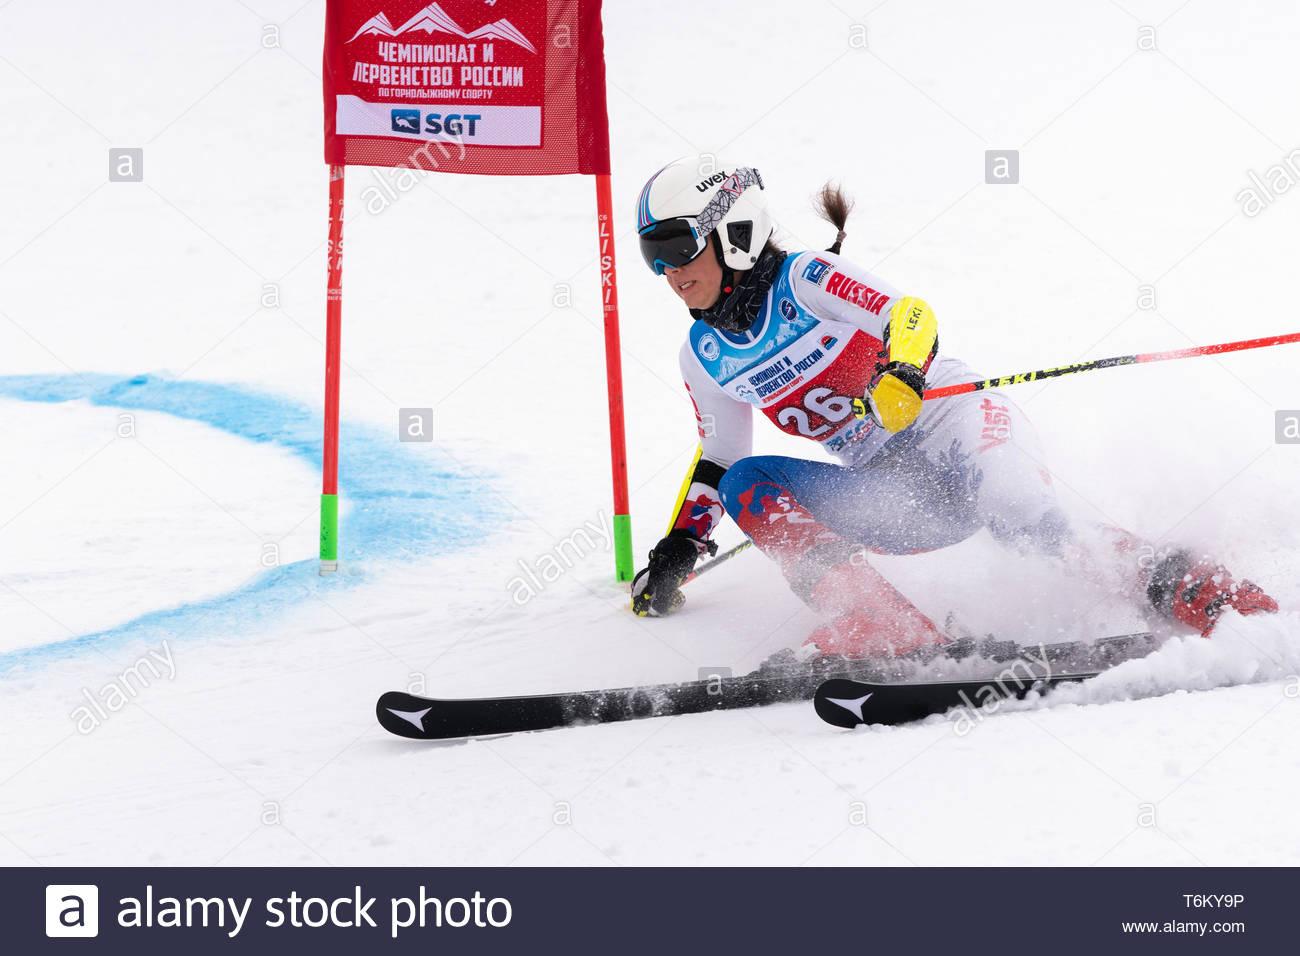 KAMCHATKA, RUSSIA - APR 2, 2019: Mountain skier Arkhipova Sofya (Sverdlovsk Region) skiing down mount slope. Russian Women's Alpine Skiing Cup, Intern - Stock Image